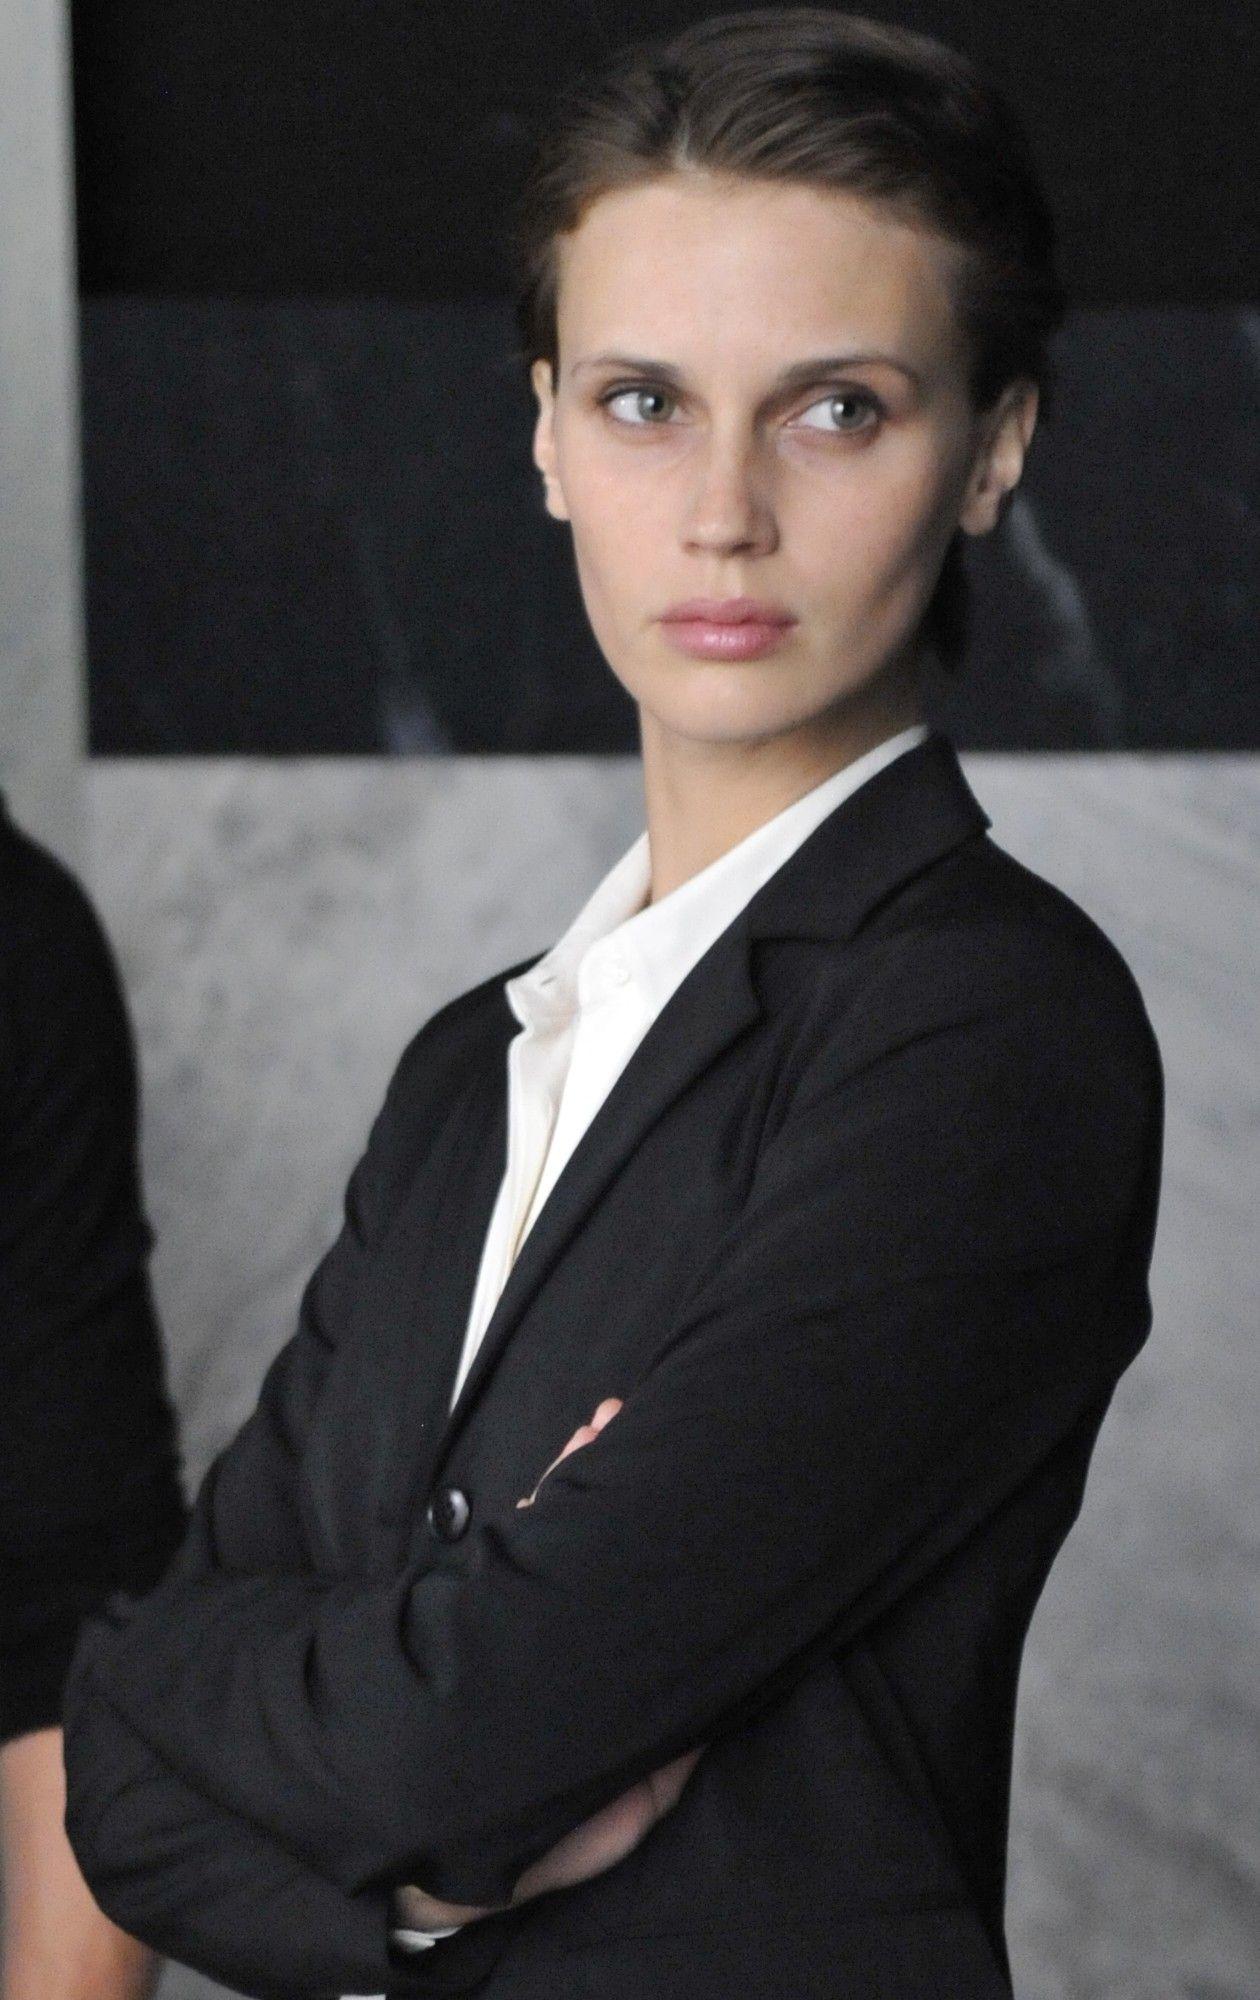 Marine Vacth French actress actrice comédienne | Double Lover / L'amant double  François Ozon, 2017